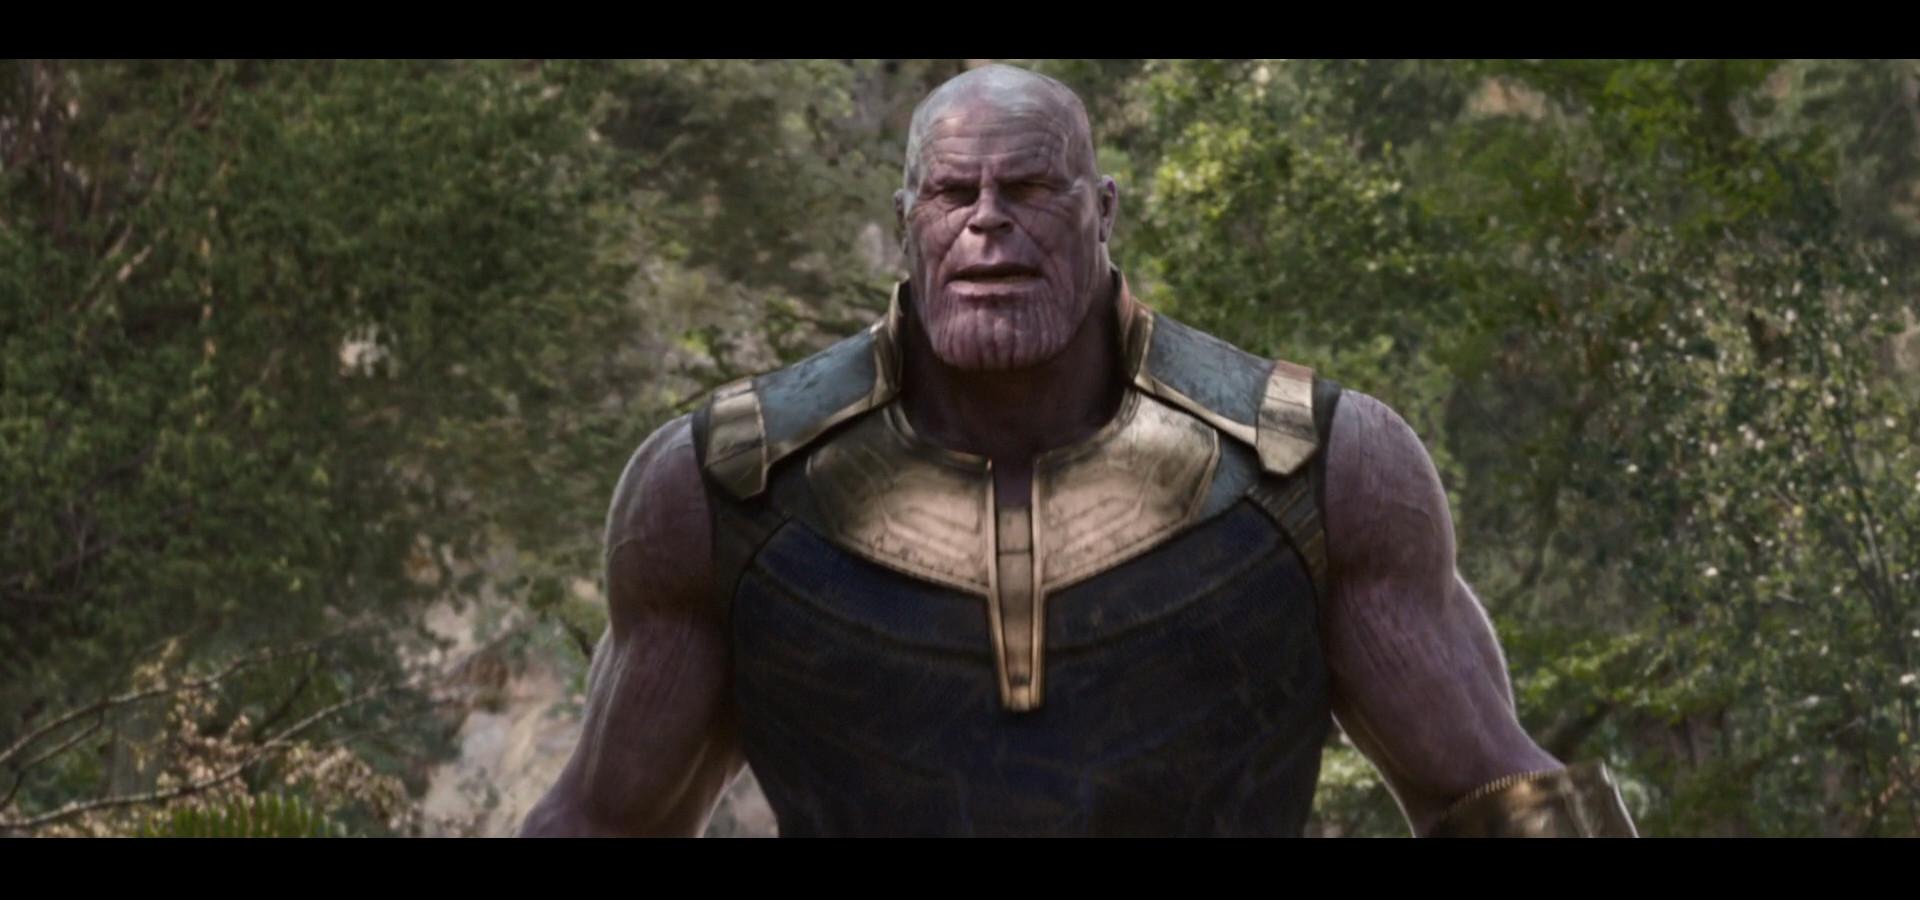 Scott knapp avengers screenshots 015